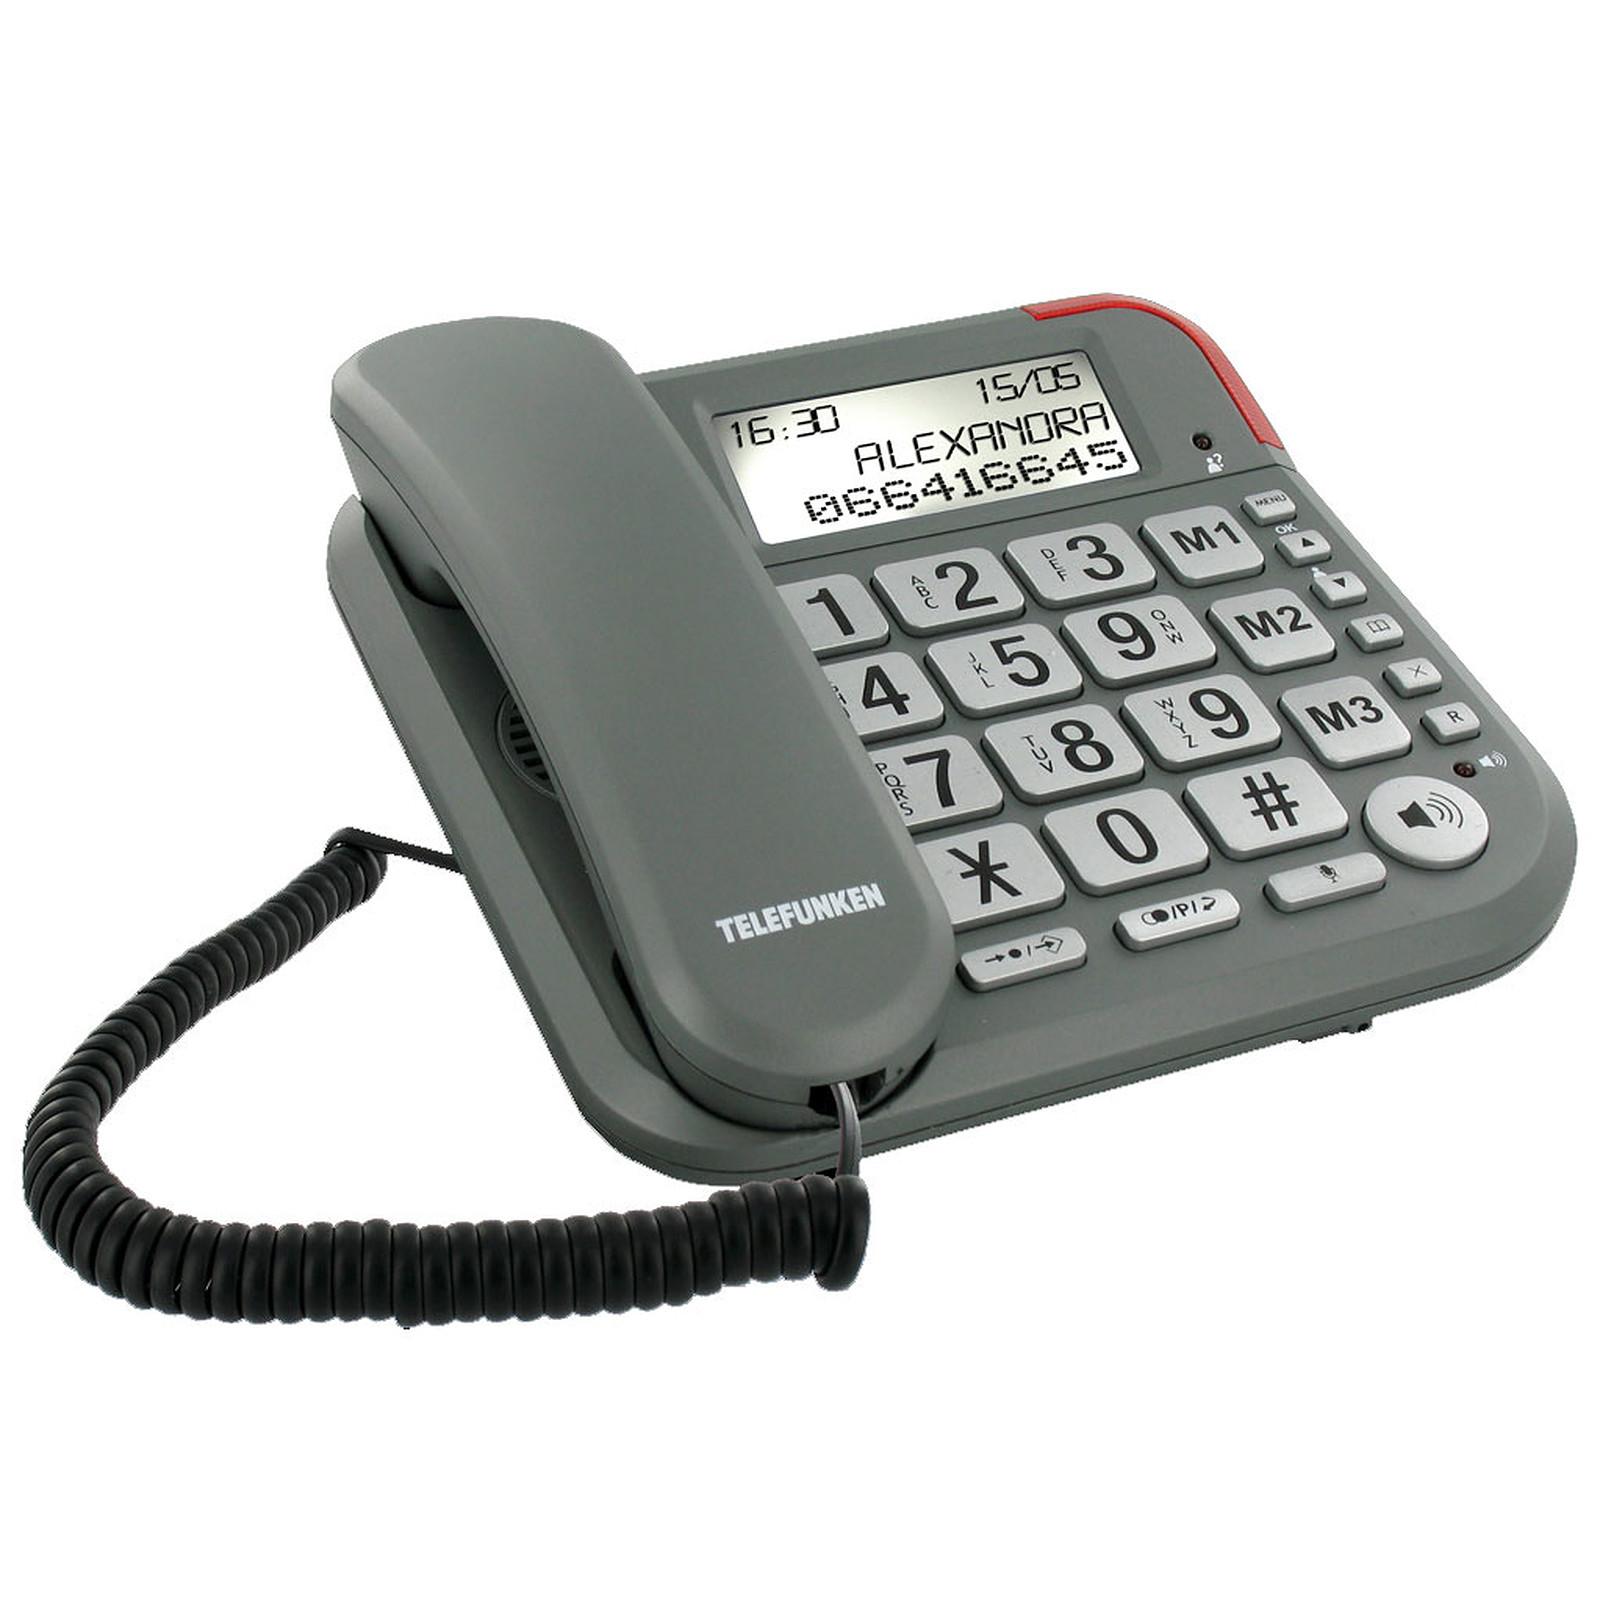 Telefunken TF 501 Cosi